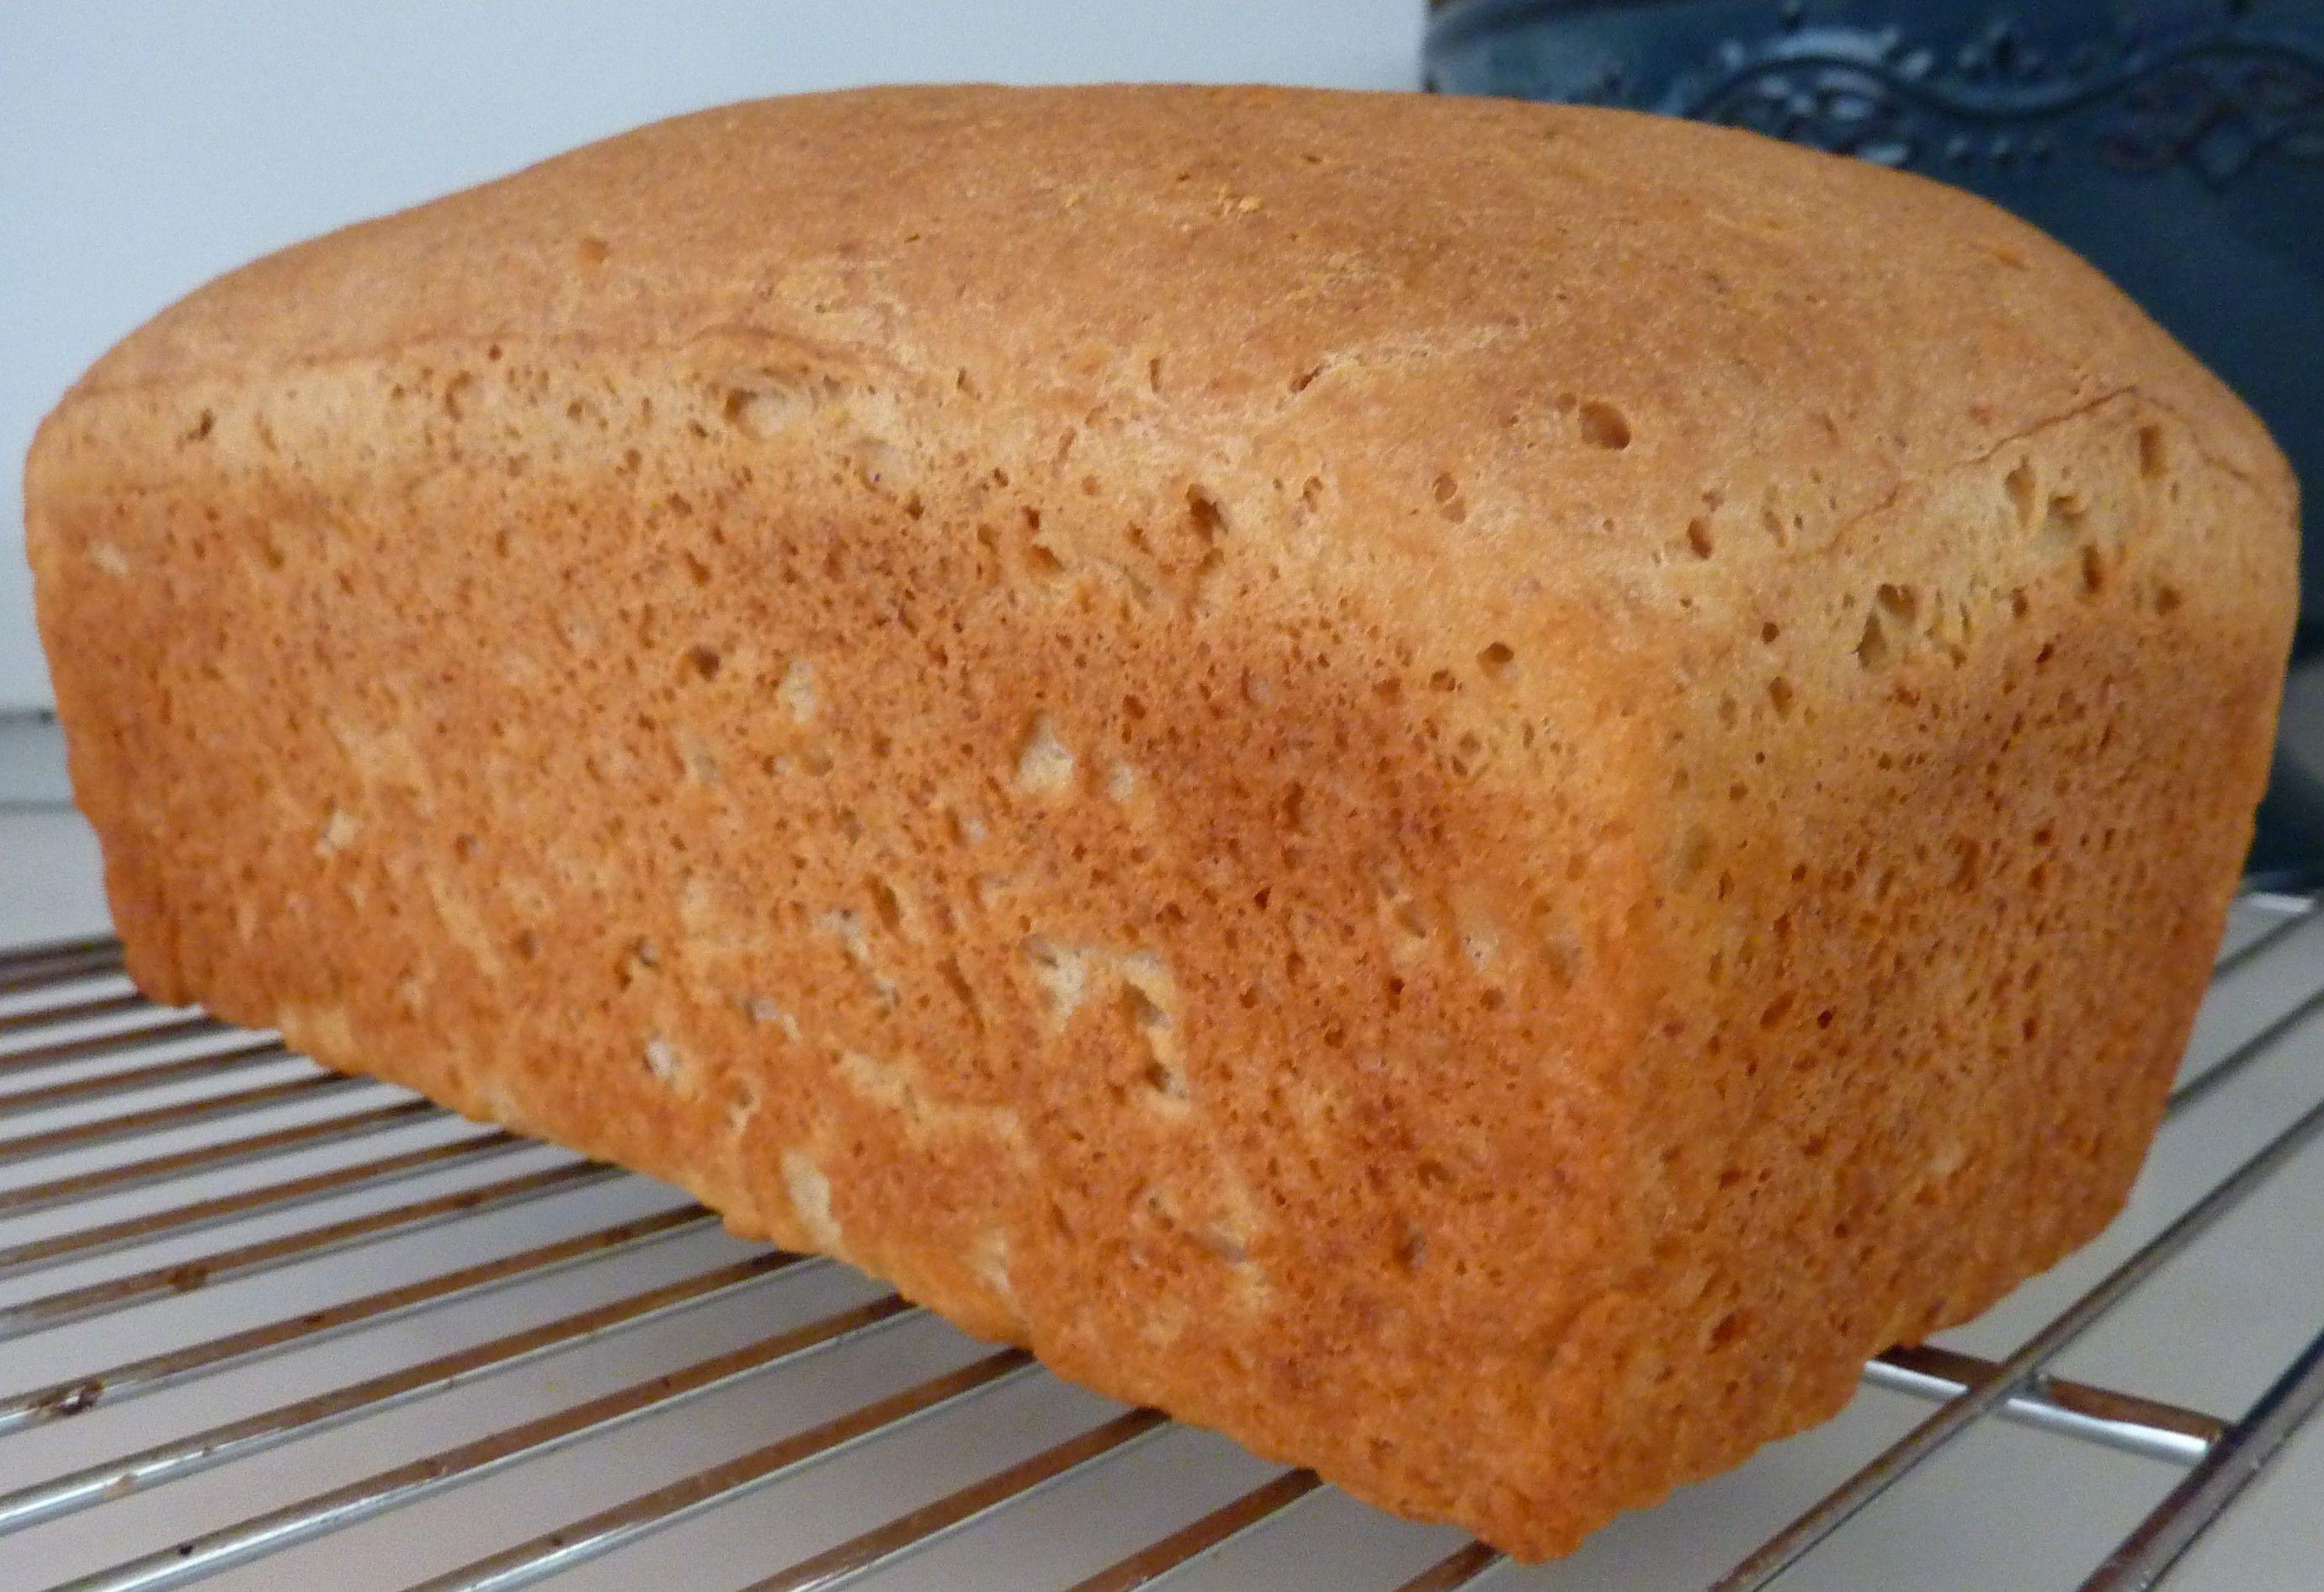 Amazing Gluten Free Bread Recipe Best Gluten Free Bread Good Gluten Free Bread Recipe Homemade Gluten Free